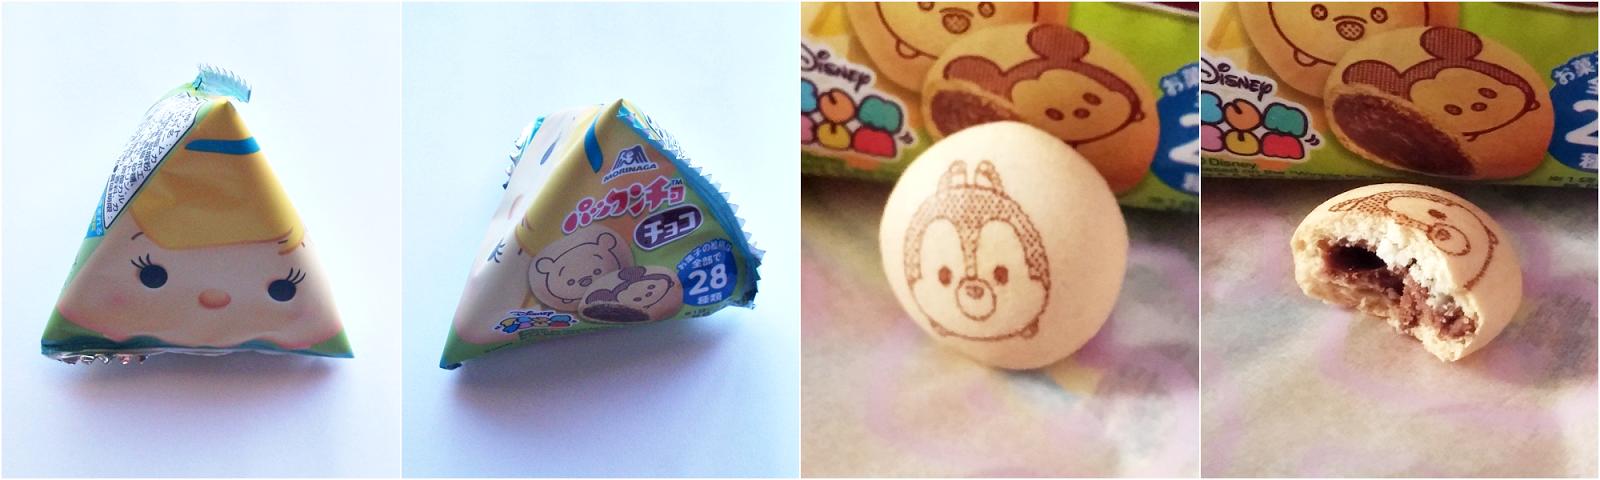 Morinaga Tsum Tsum Chocolate Biscuit